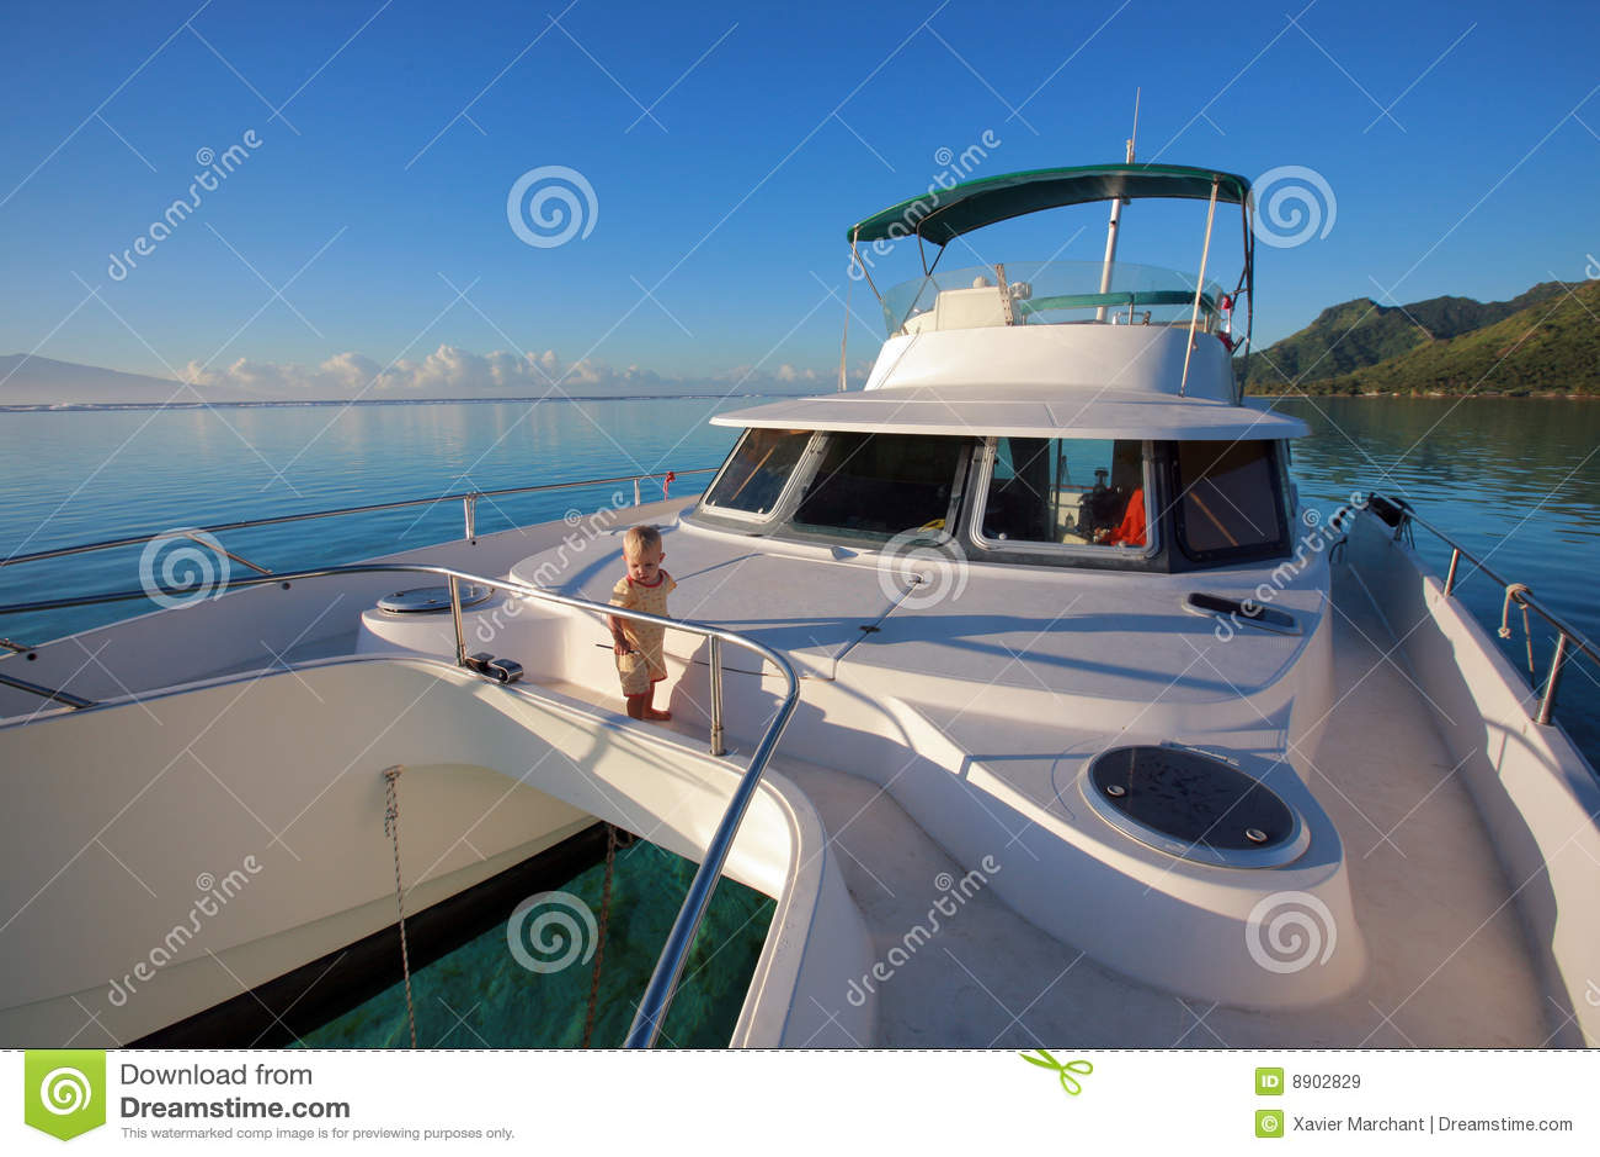 Baby on a power catamaran stock image image of island for Blue sea motor inn